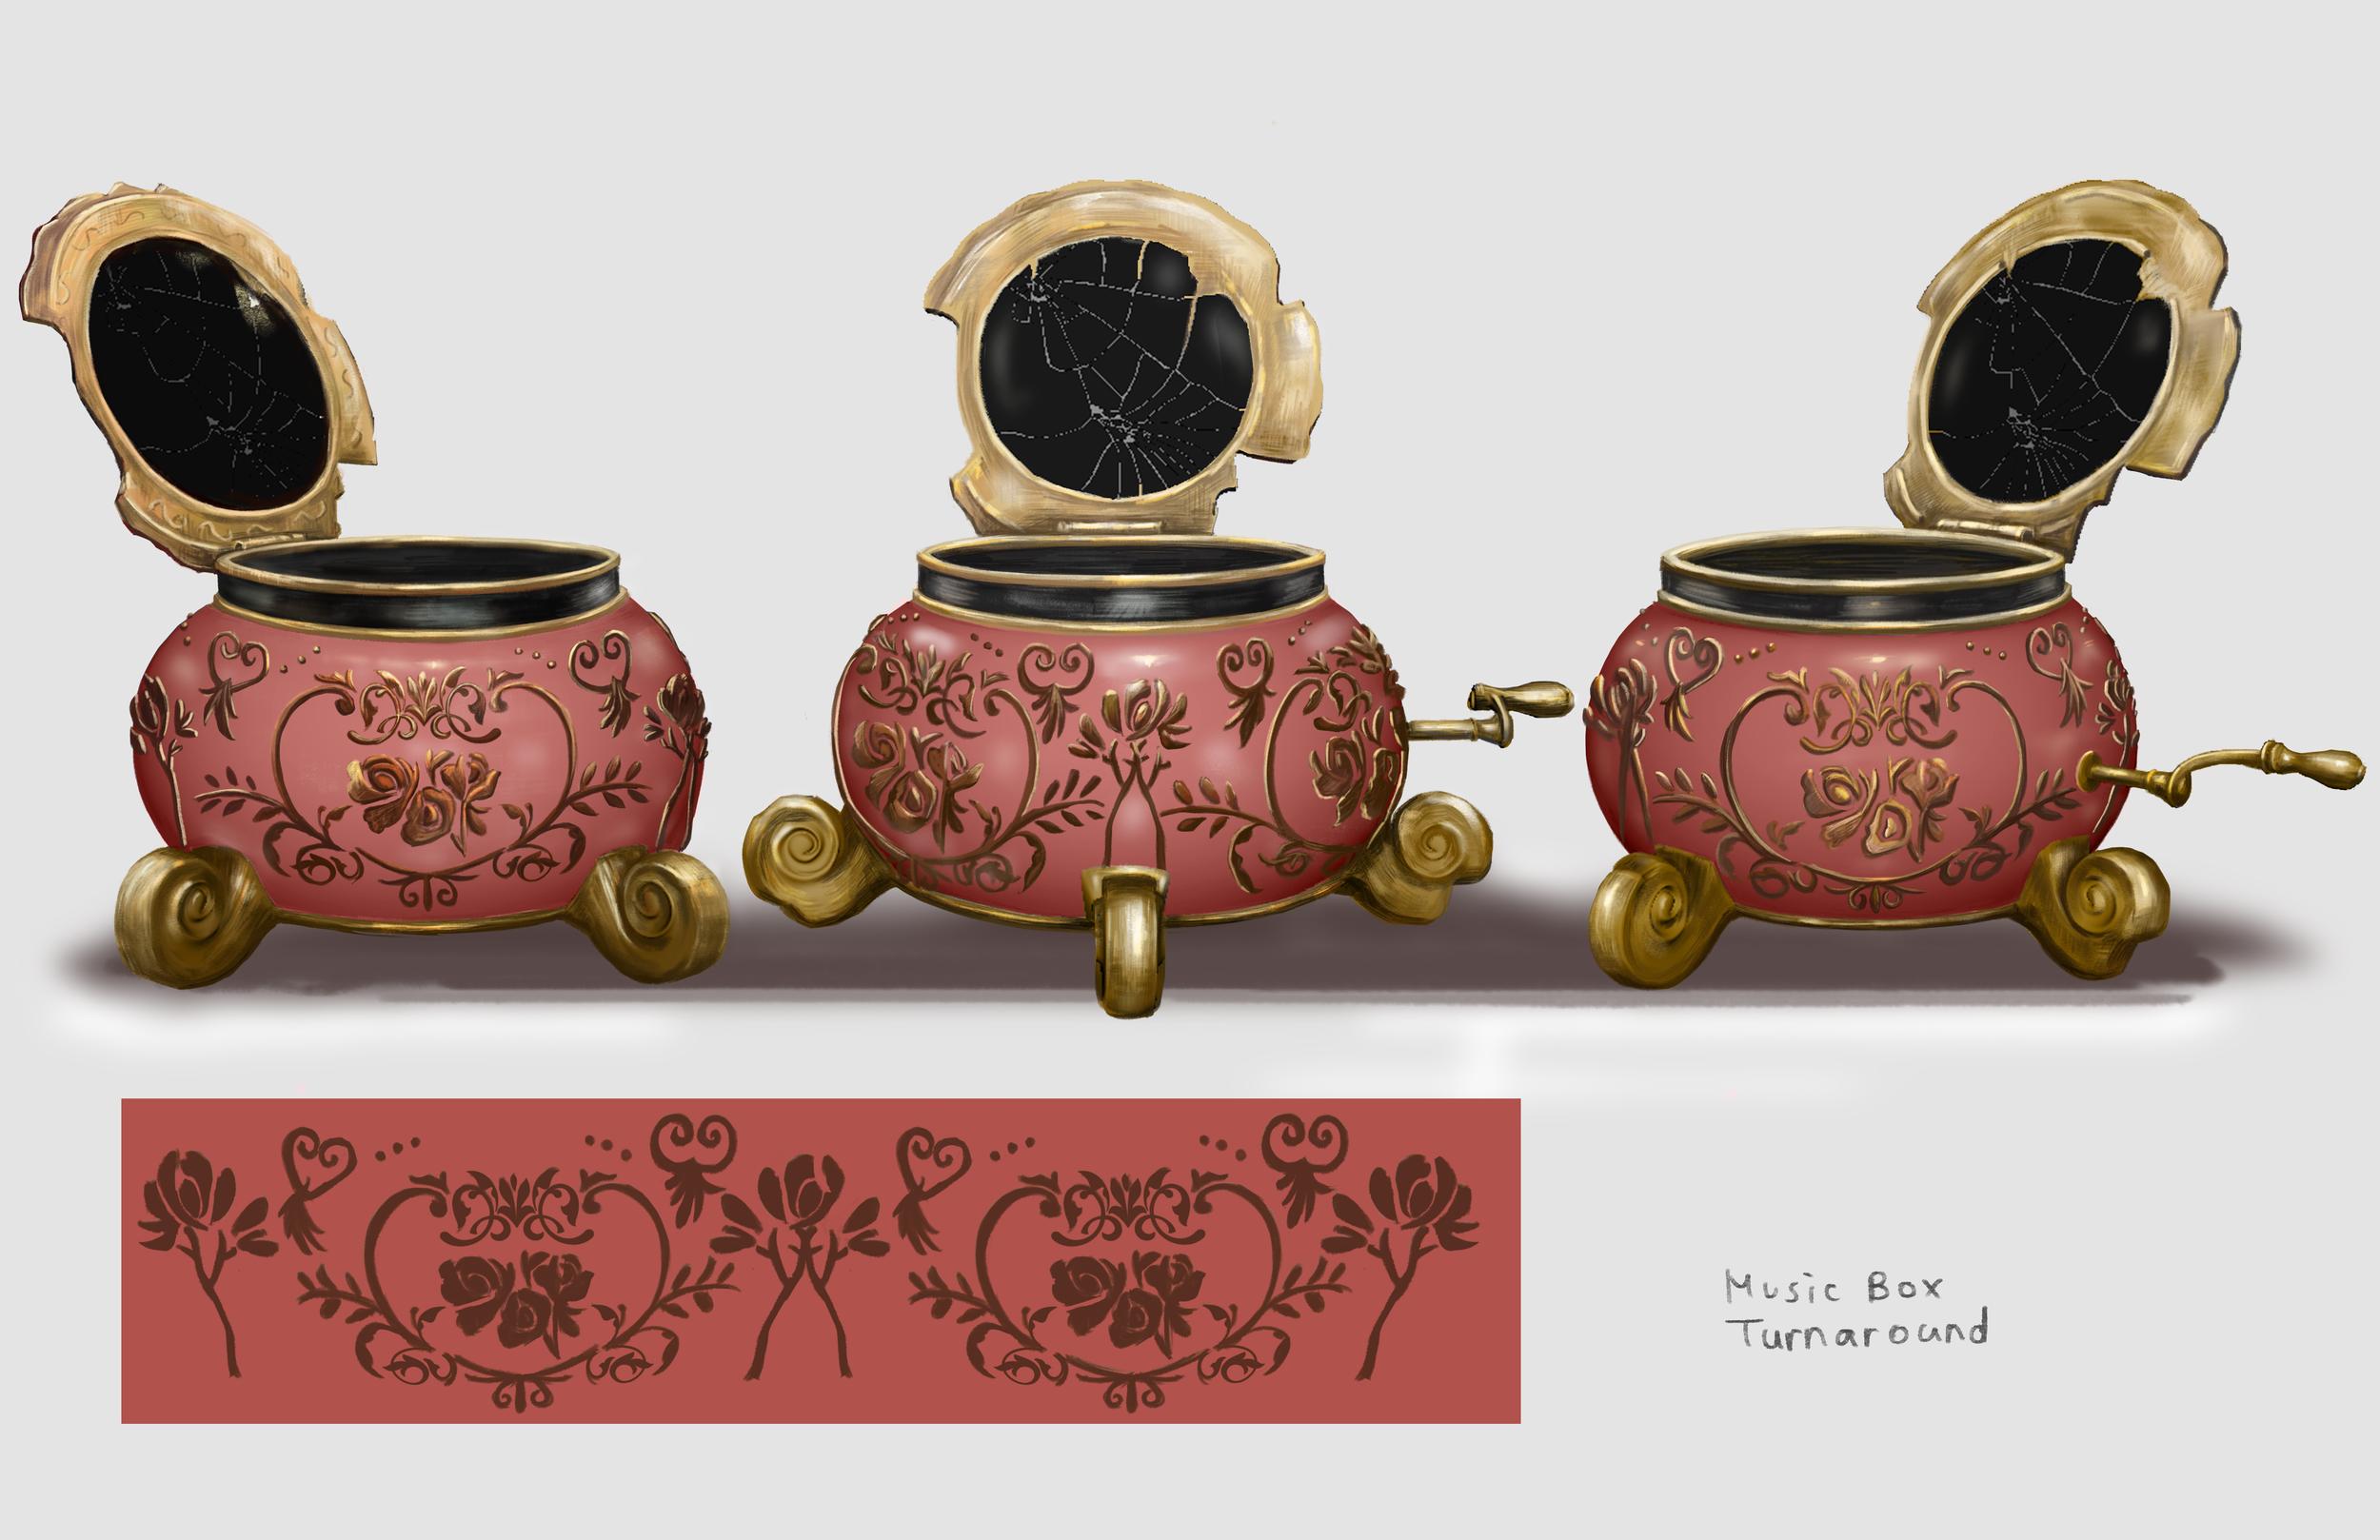 Music Box, Pattern Design